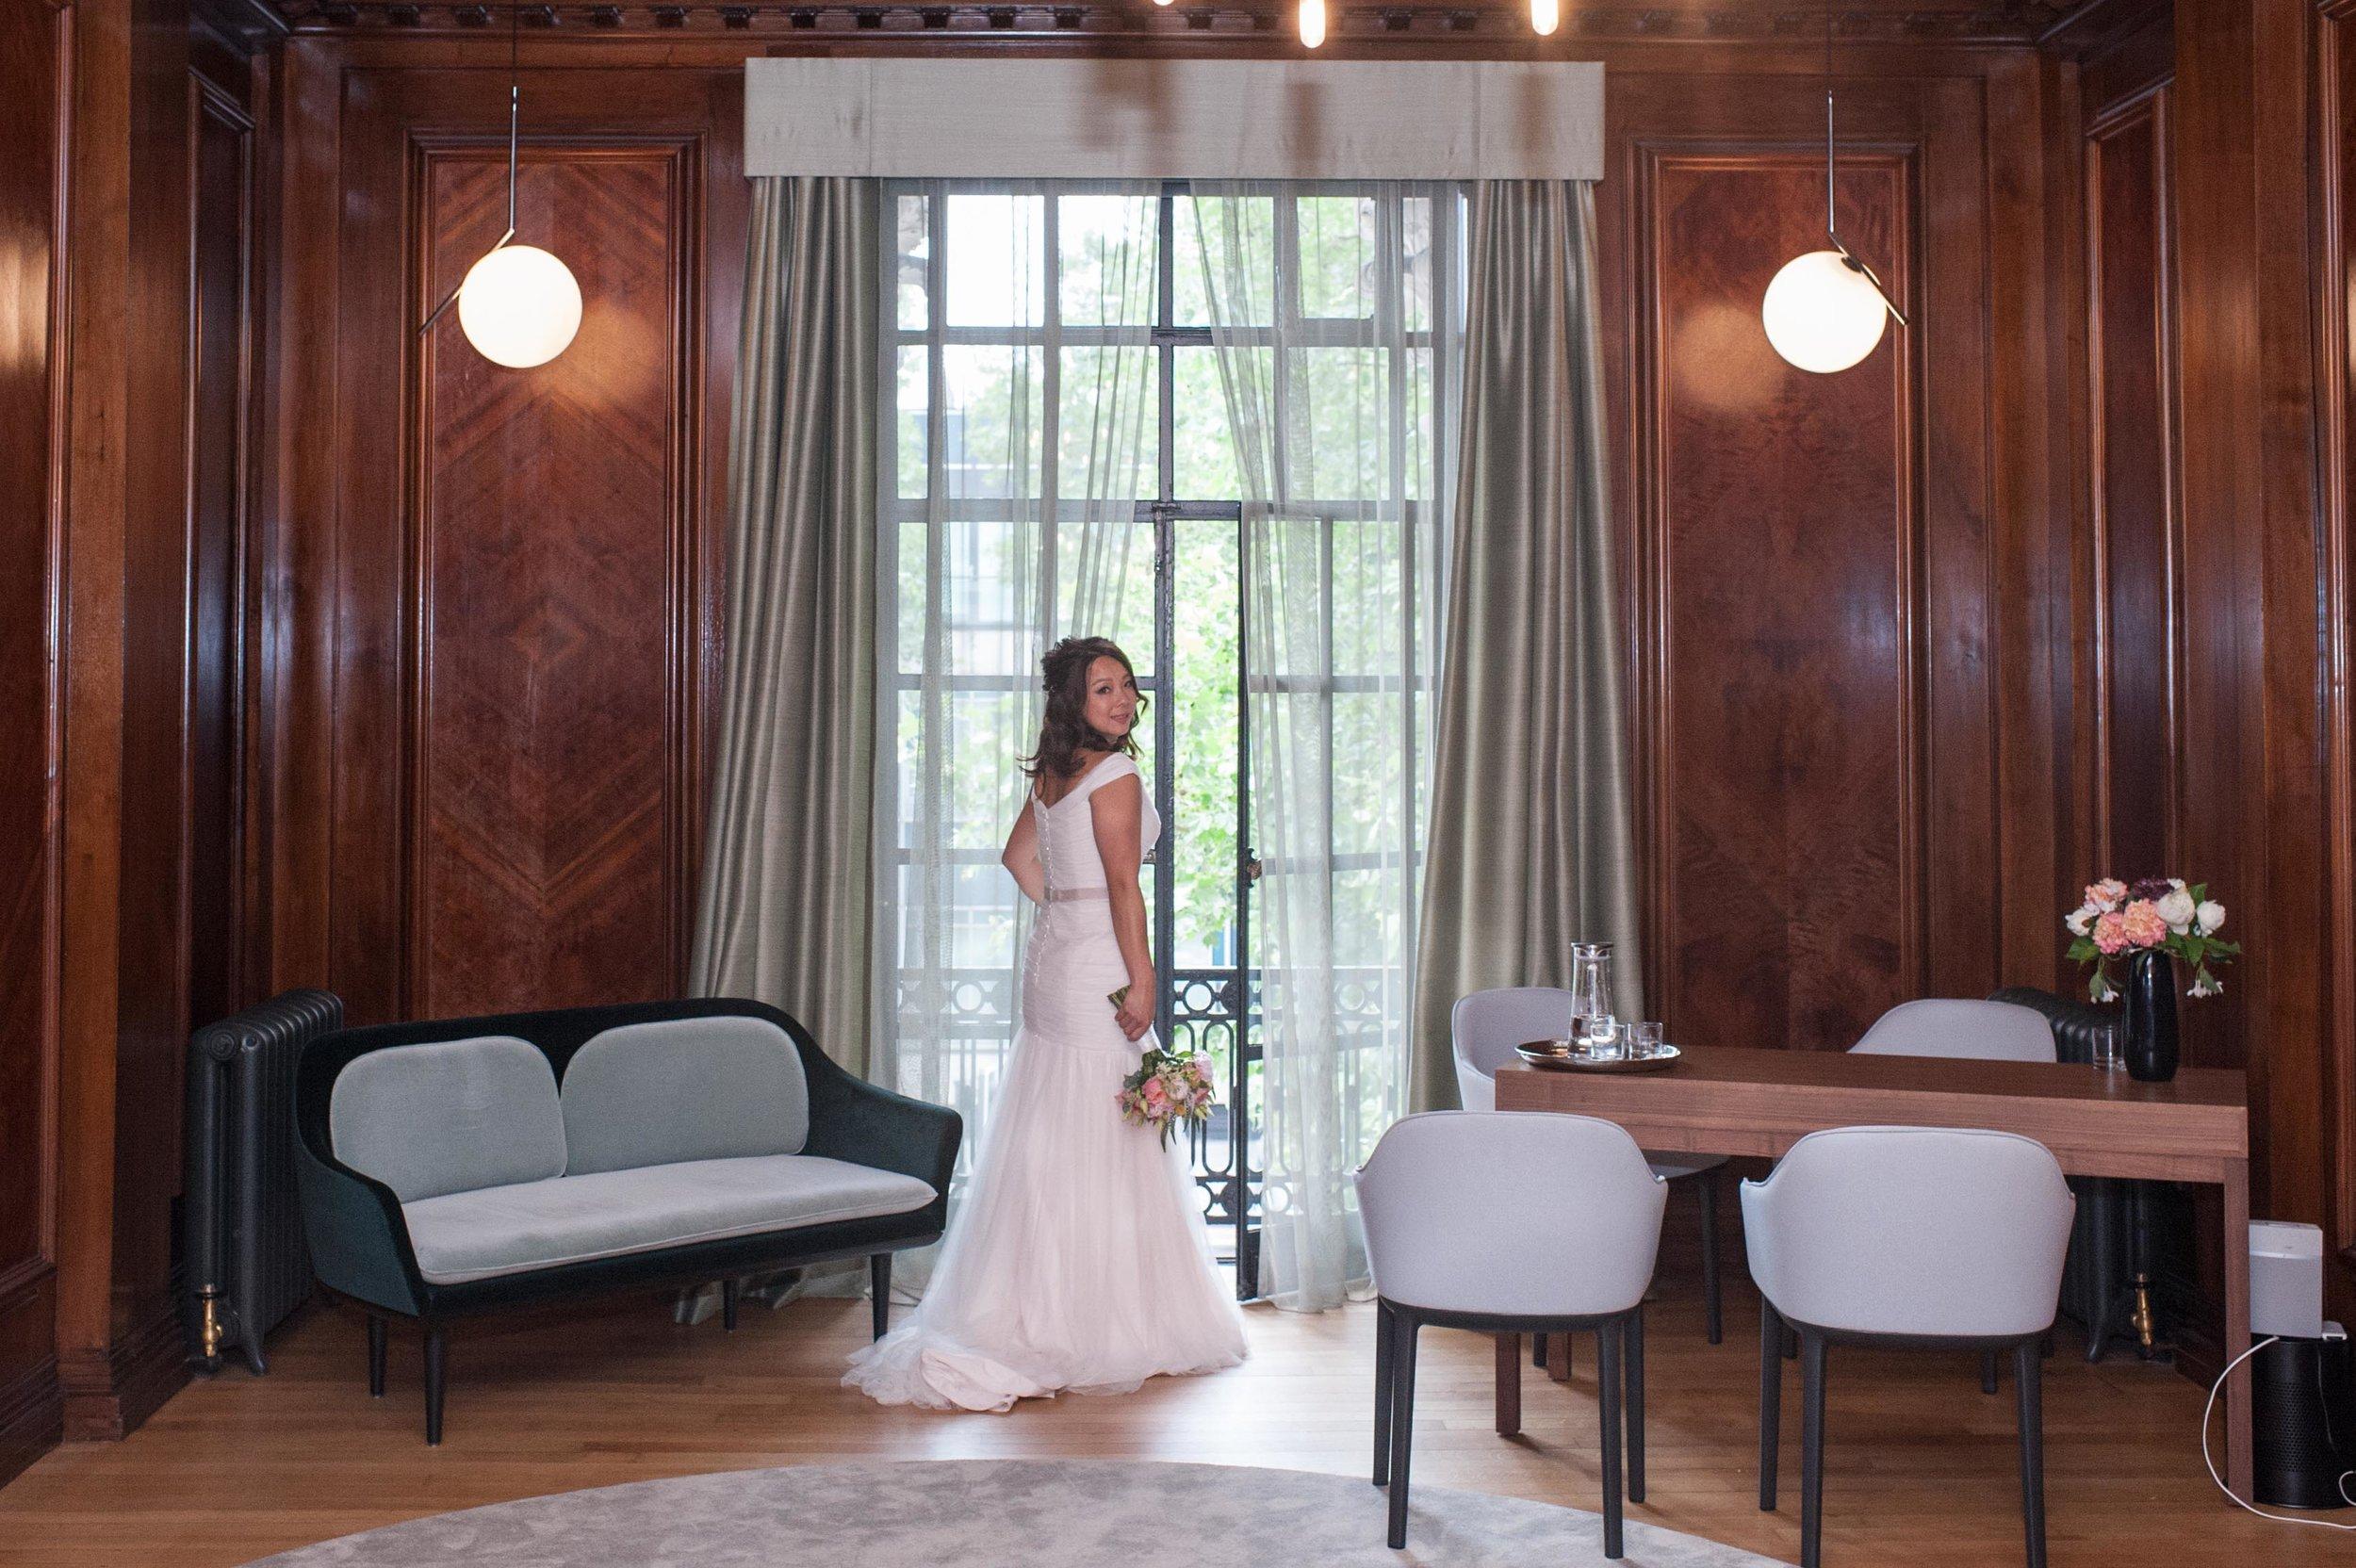 D&M_Marylebone Town Hall Wedding (73 of 239).jpg